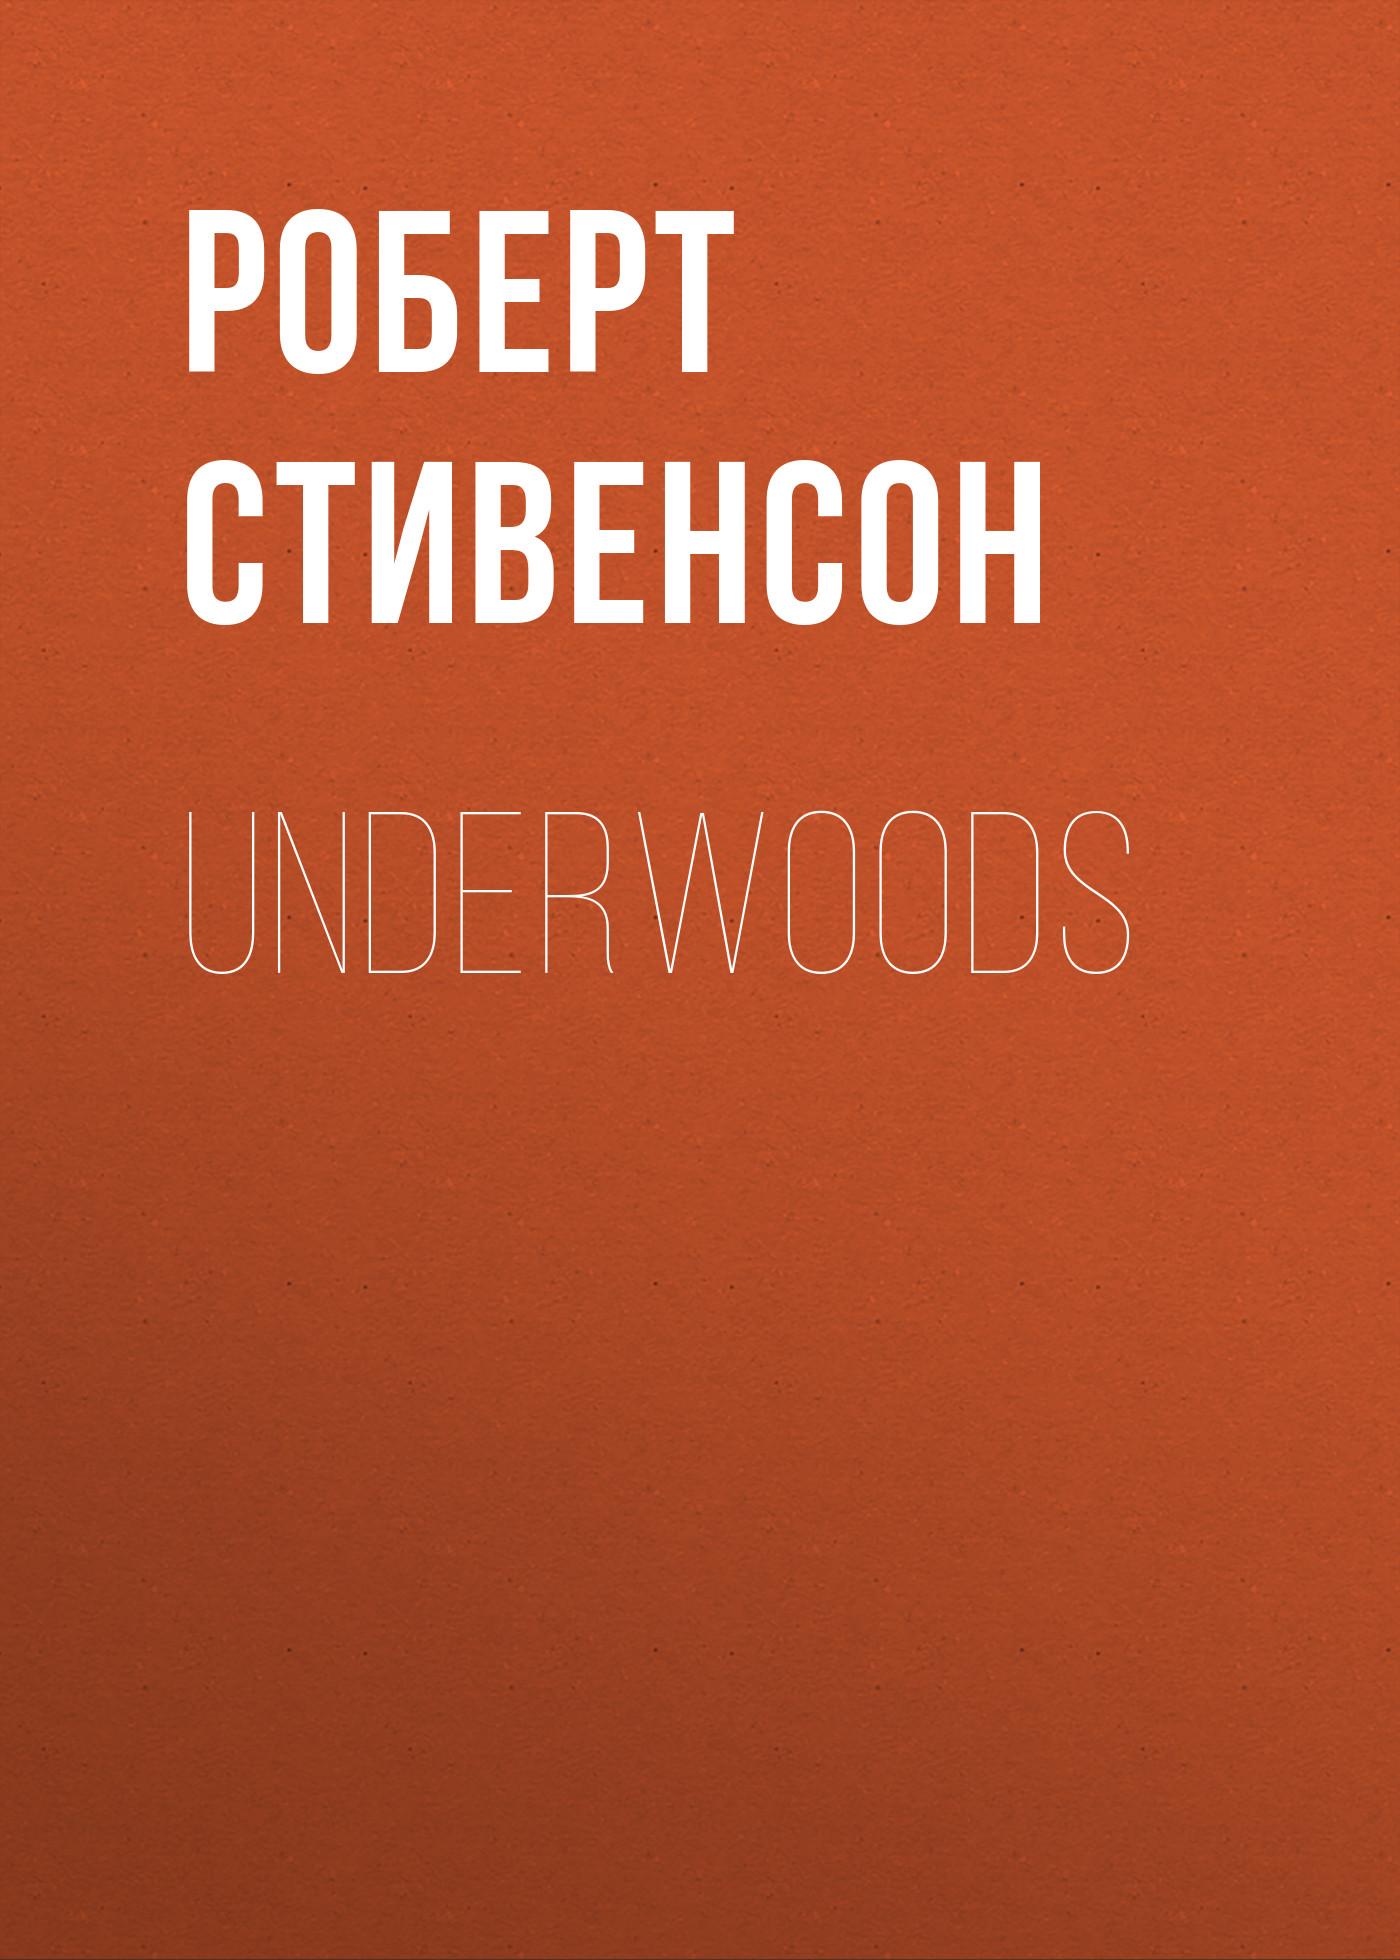 все цены на Роберт Льюис Стивенсон Underwoods онлайн